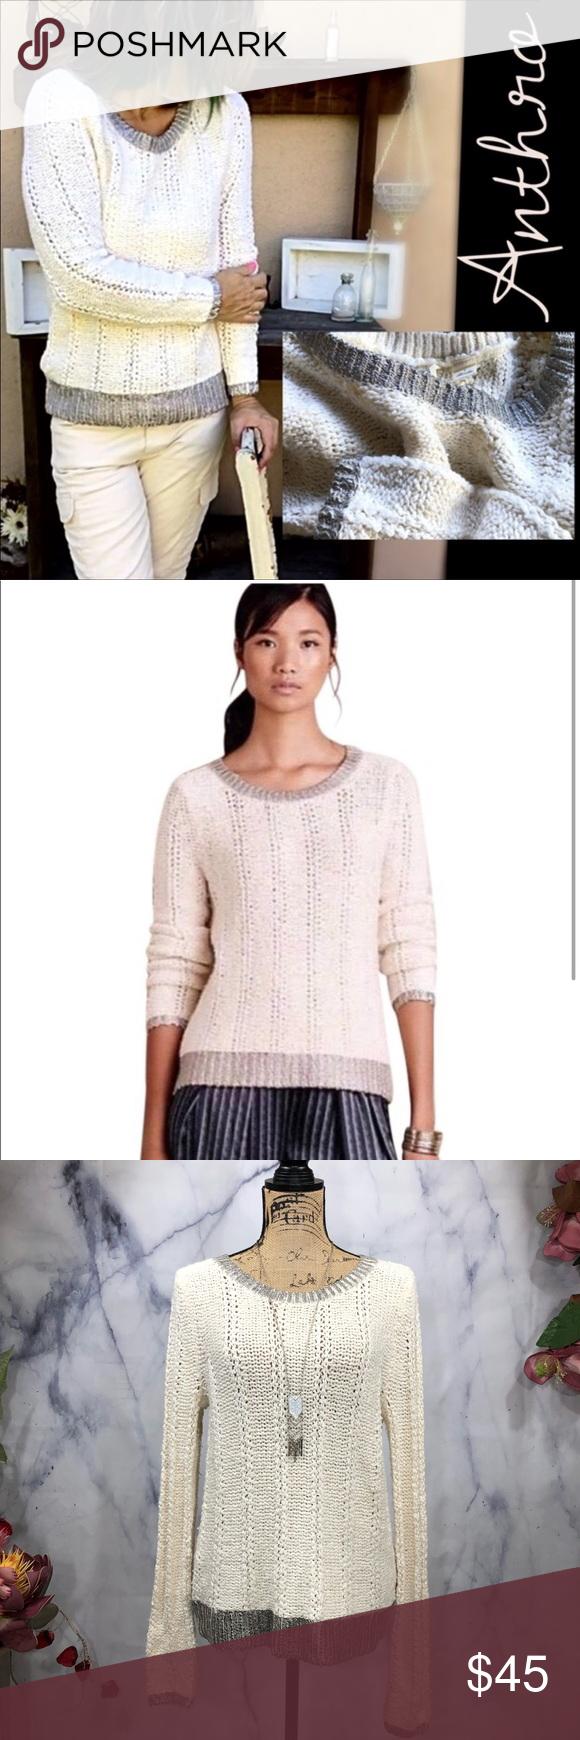 7a393d49676 Anthropologie-Moth-Wool Blend Silver Trim Sweater Anthropologie-Moth-Wool  Blend Silver